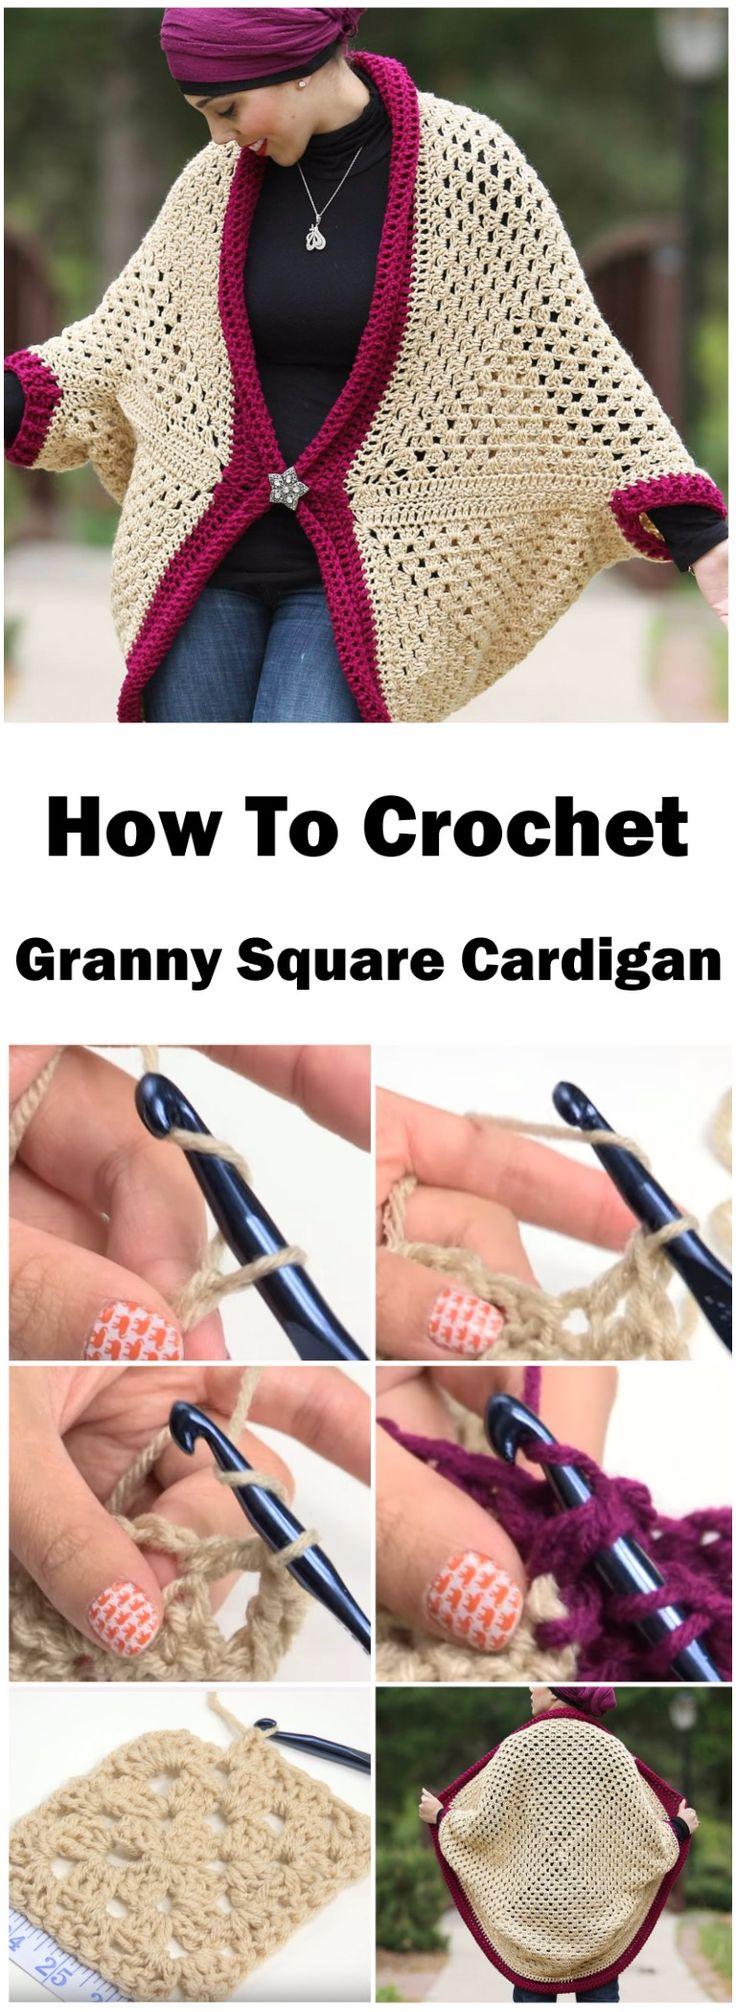 Crochet Granny Square Cardigan